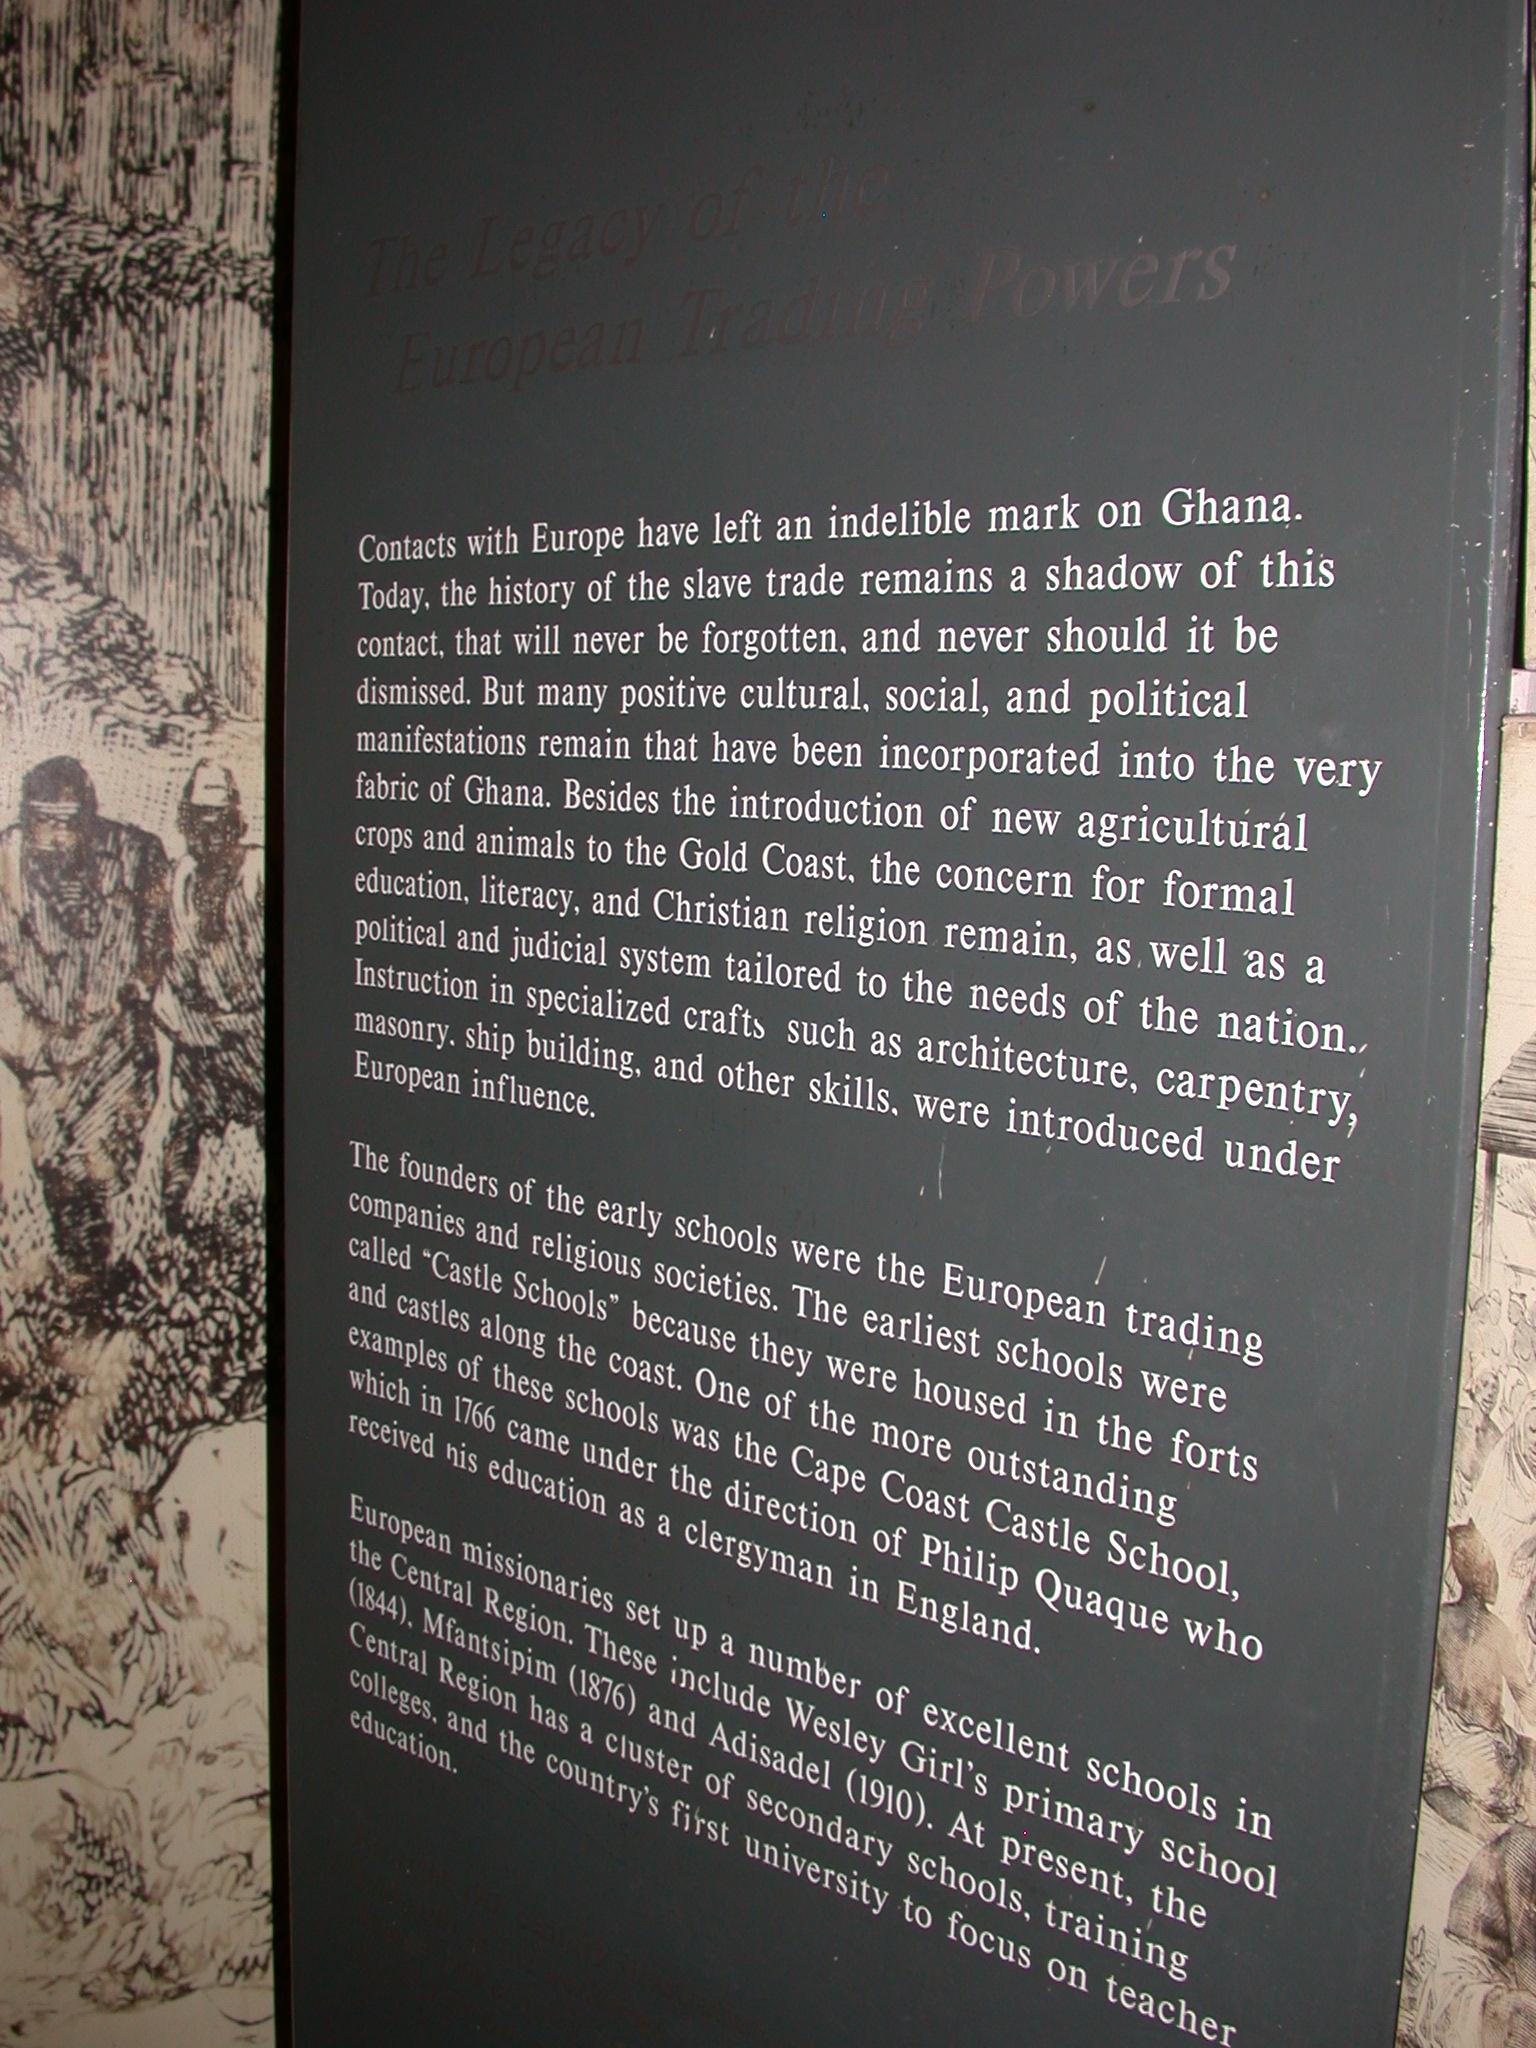 Europeans in Ghana Legacy Description, Cape Coast Slave Fort Museum, Cape Coast, Ghana